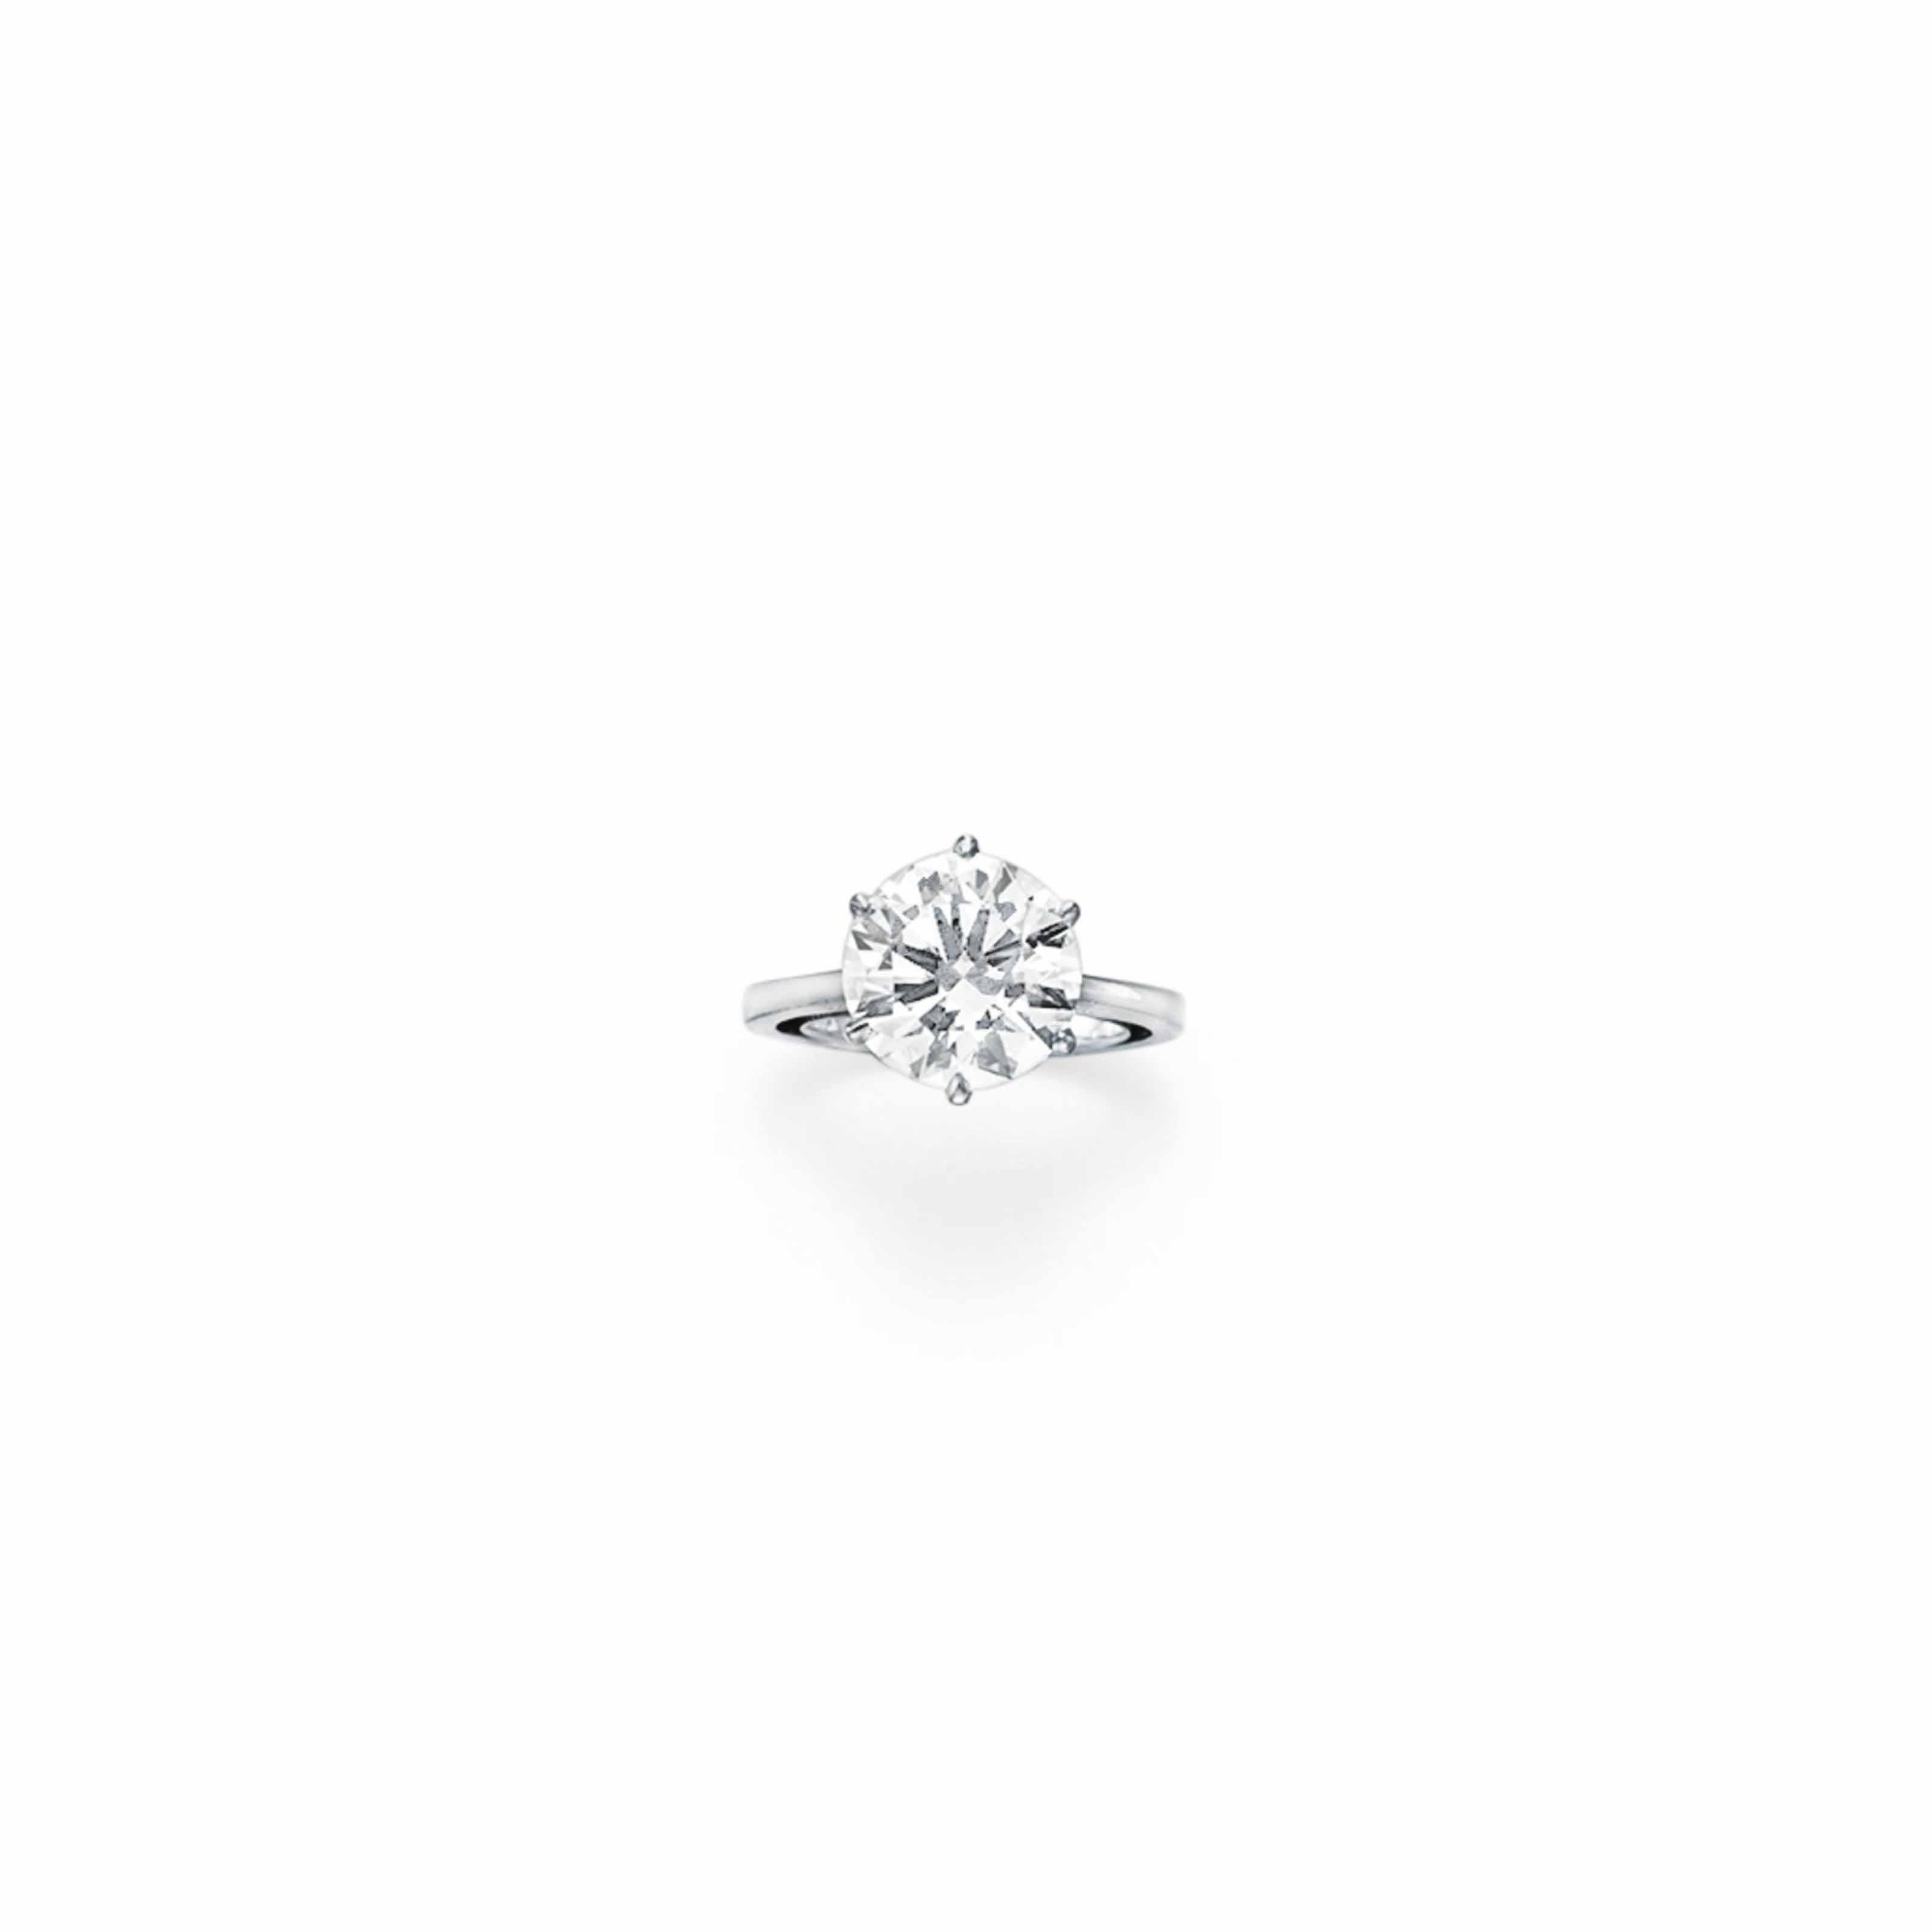 A DIAMOND RING, BY GÜBELIN